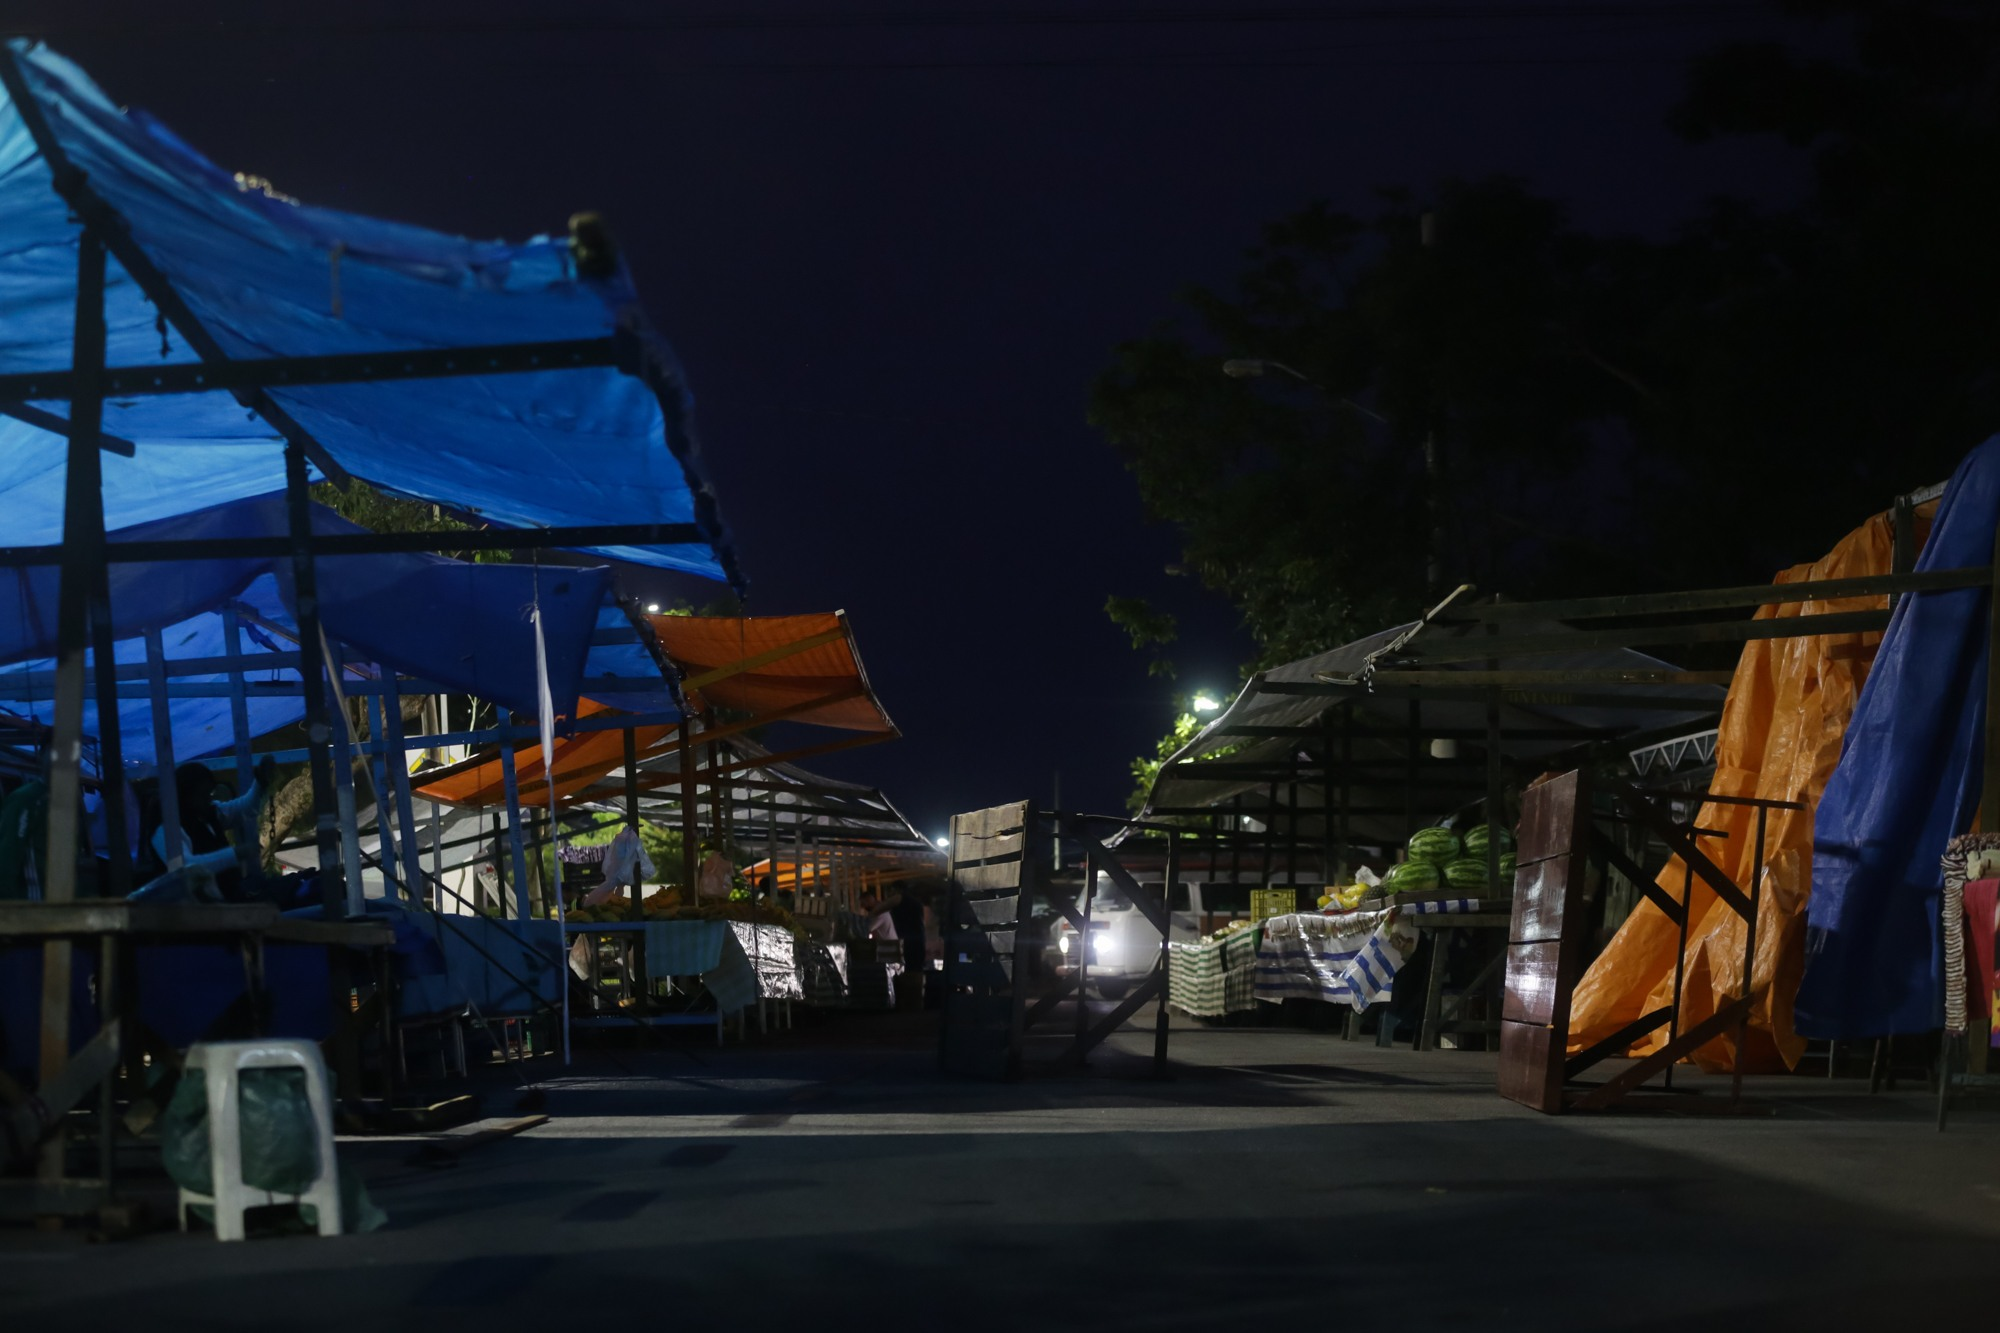 feirante itapecerica baixas-3698